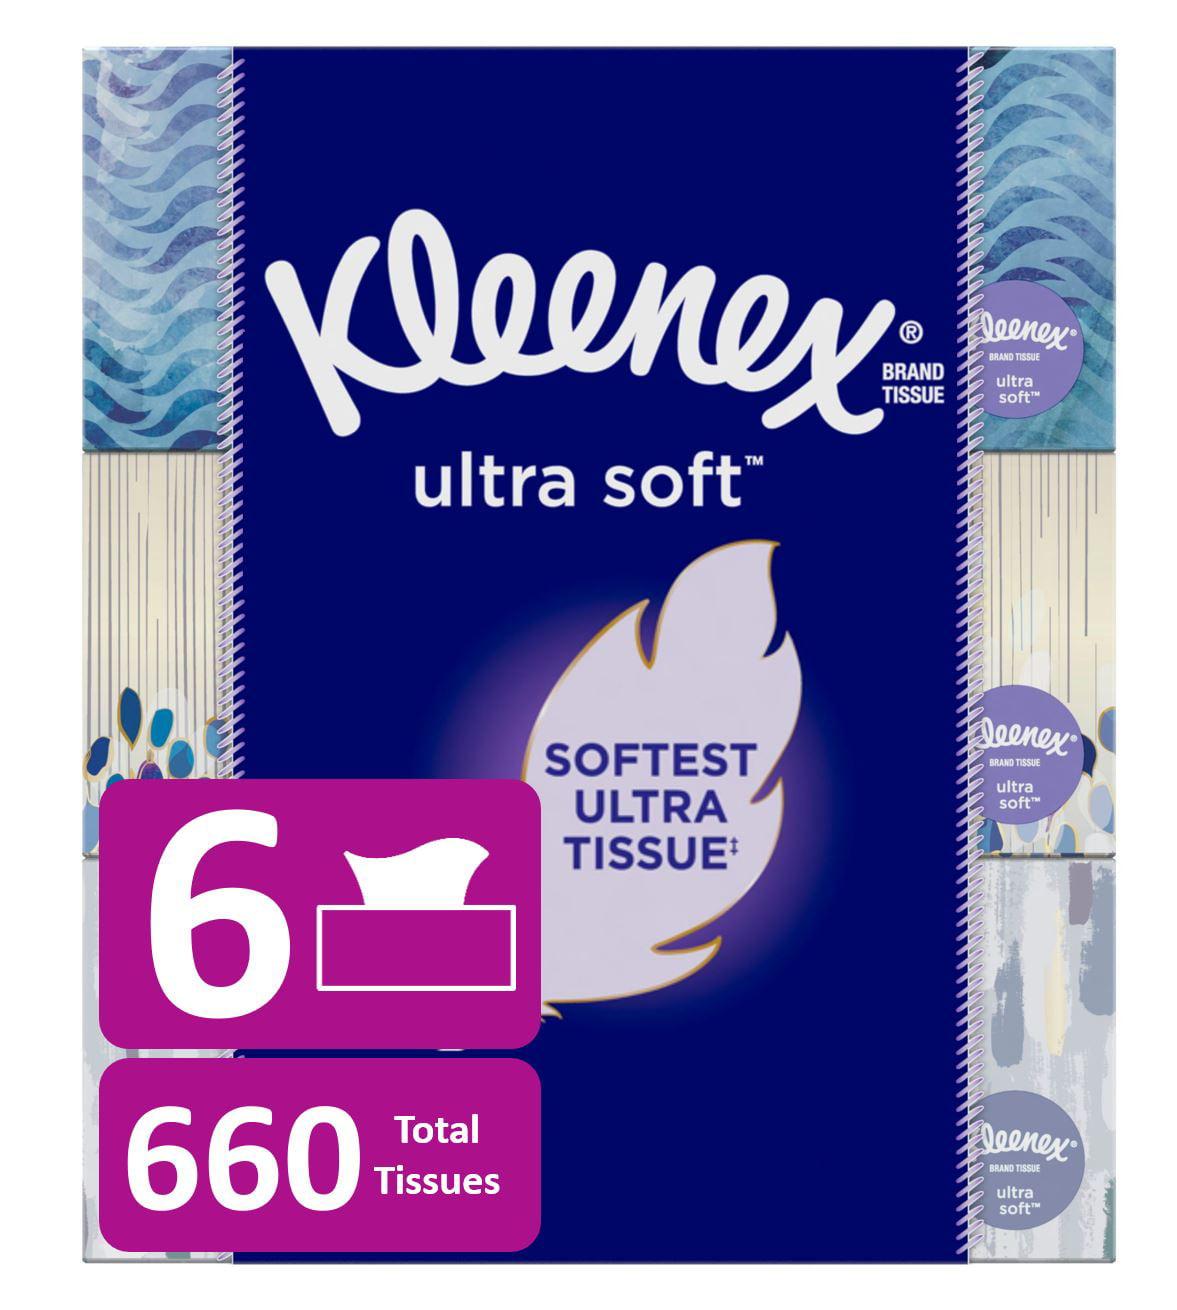 Total Of 648 Tissu Kleenex White Facial Tissue 72 Pack Of 9 Tissue Each Pocket